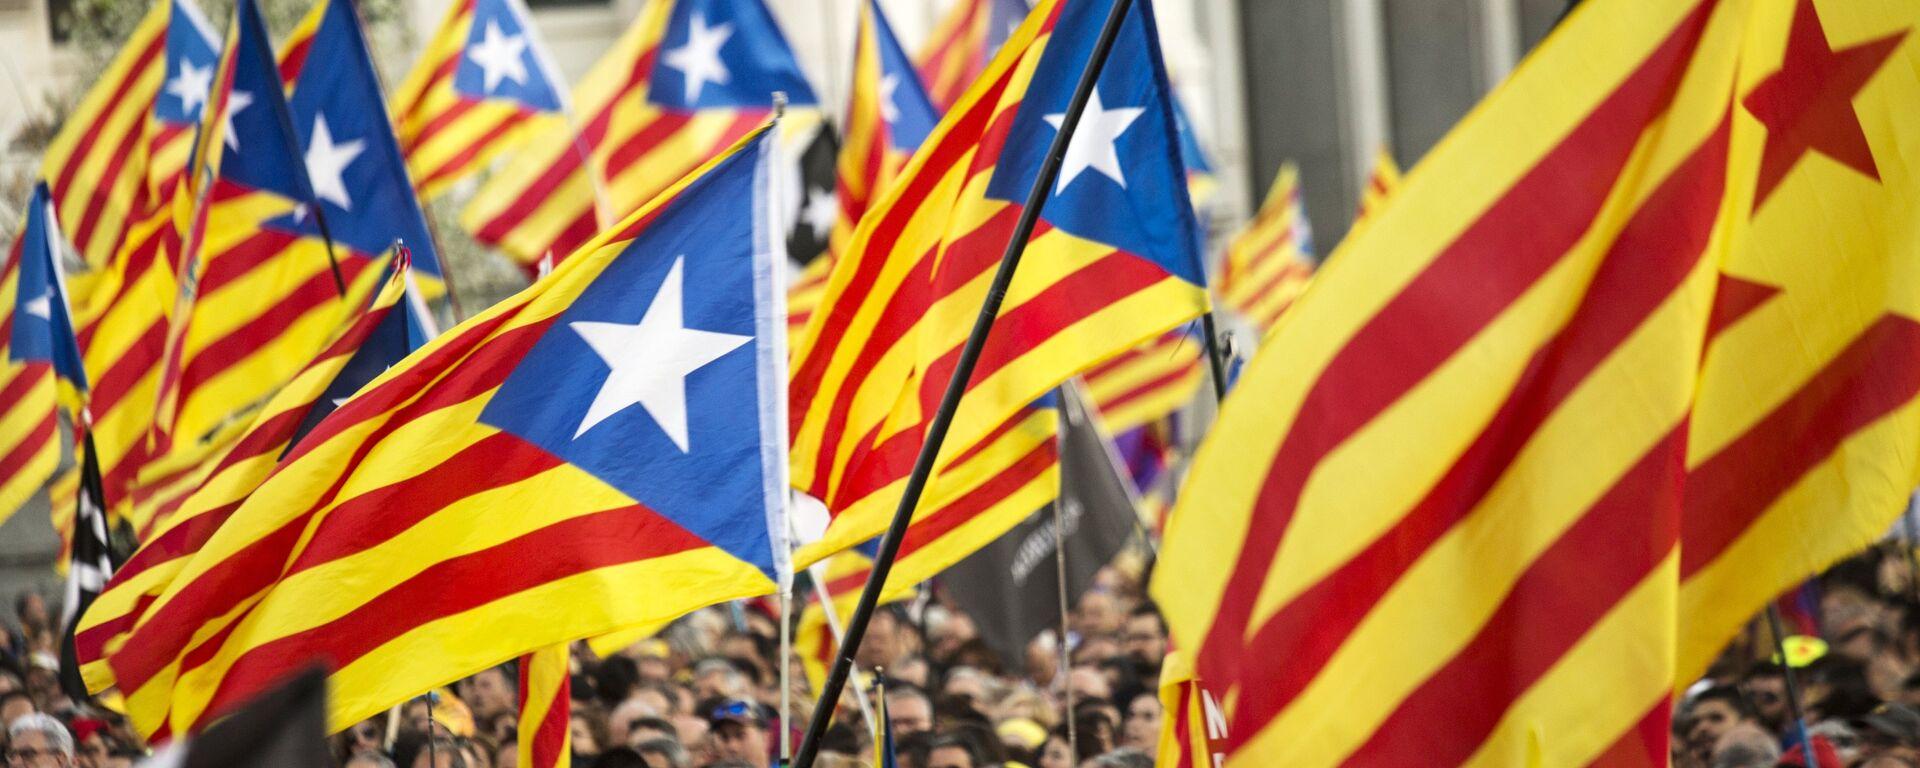 Una protesta a favor de independencia de Cataluña - Sputnik Mundo, 1920, 17.05.2021